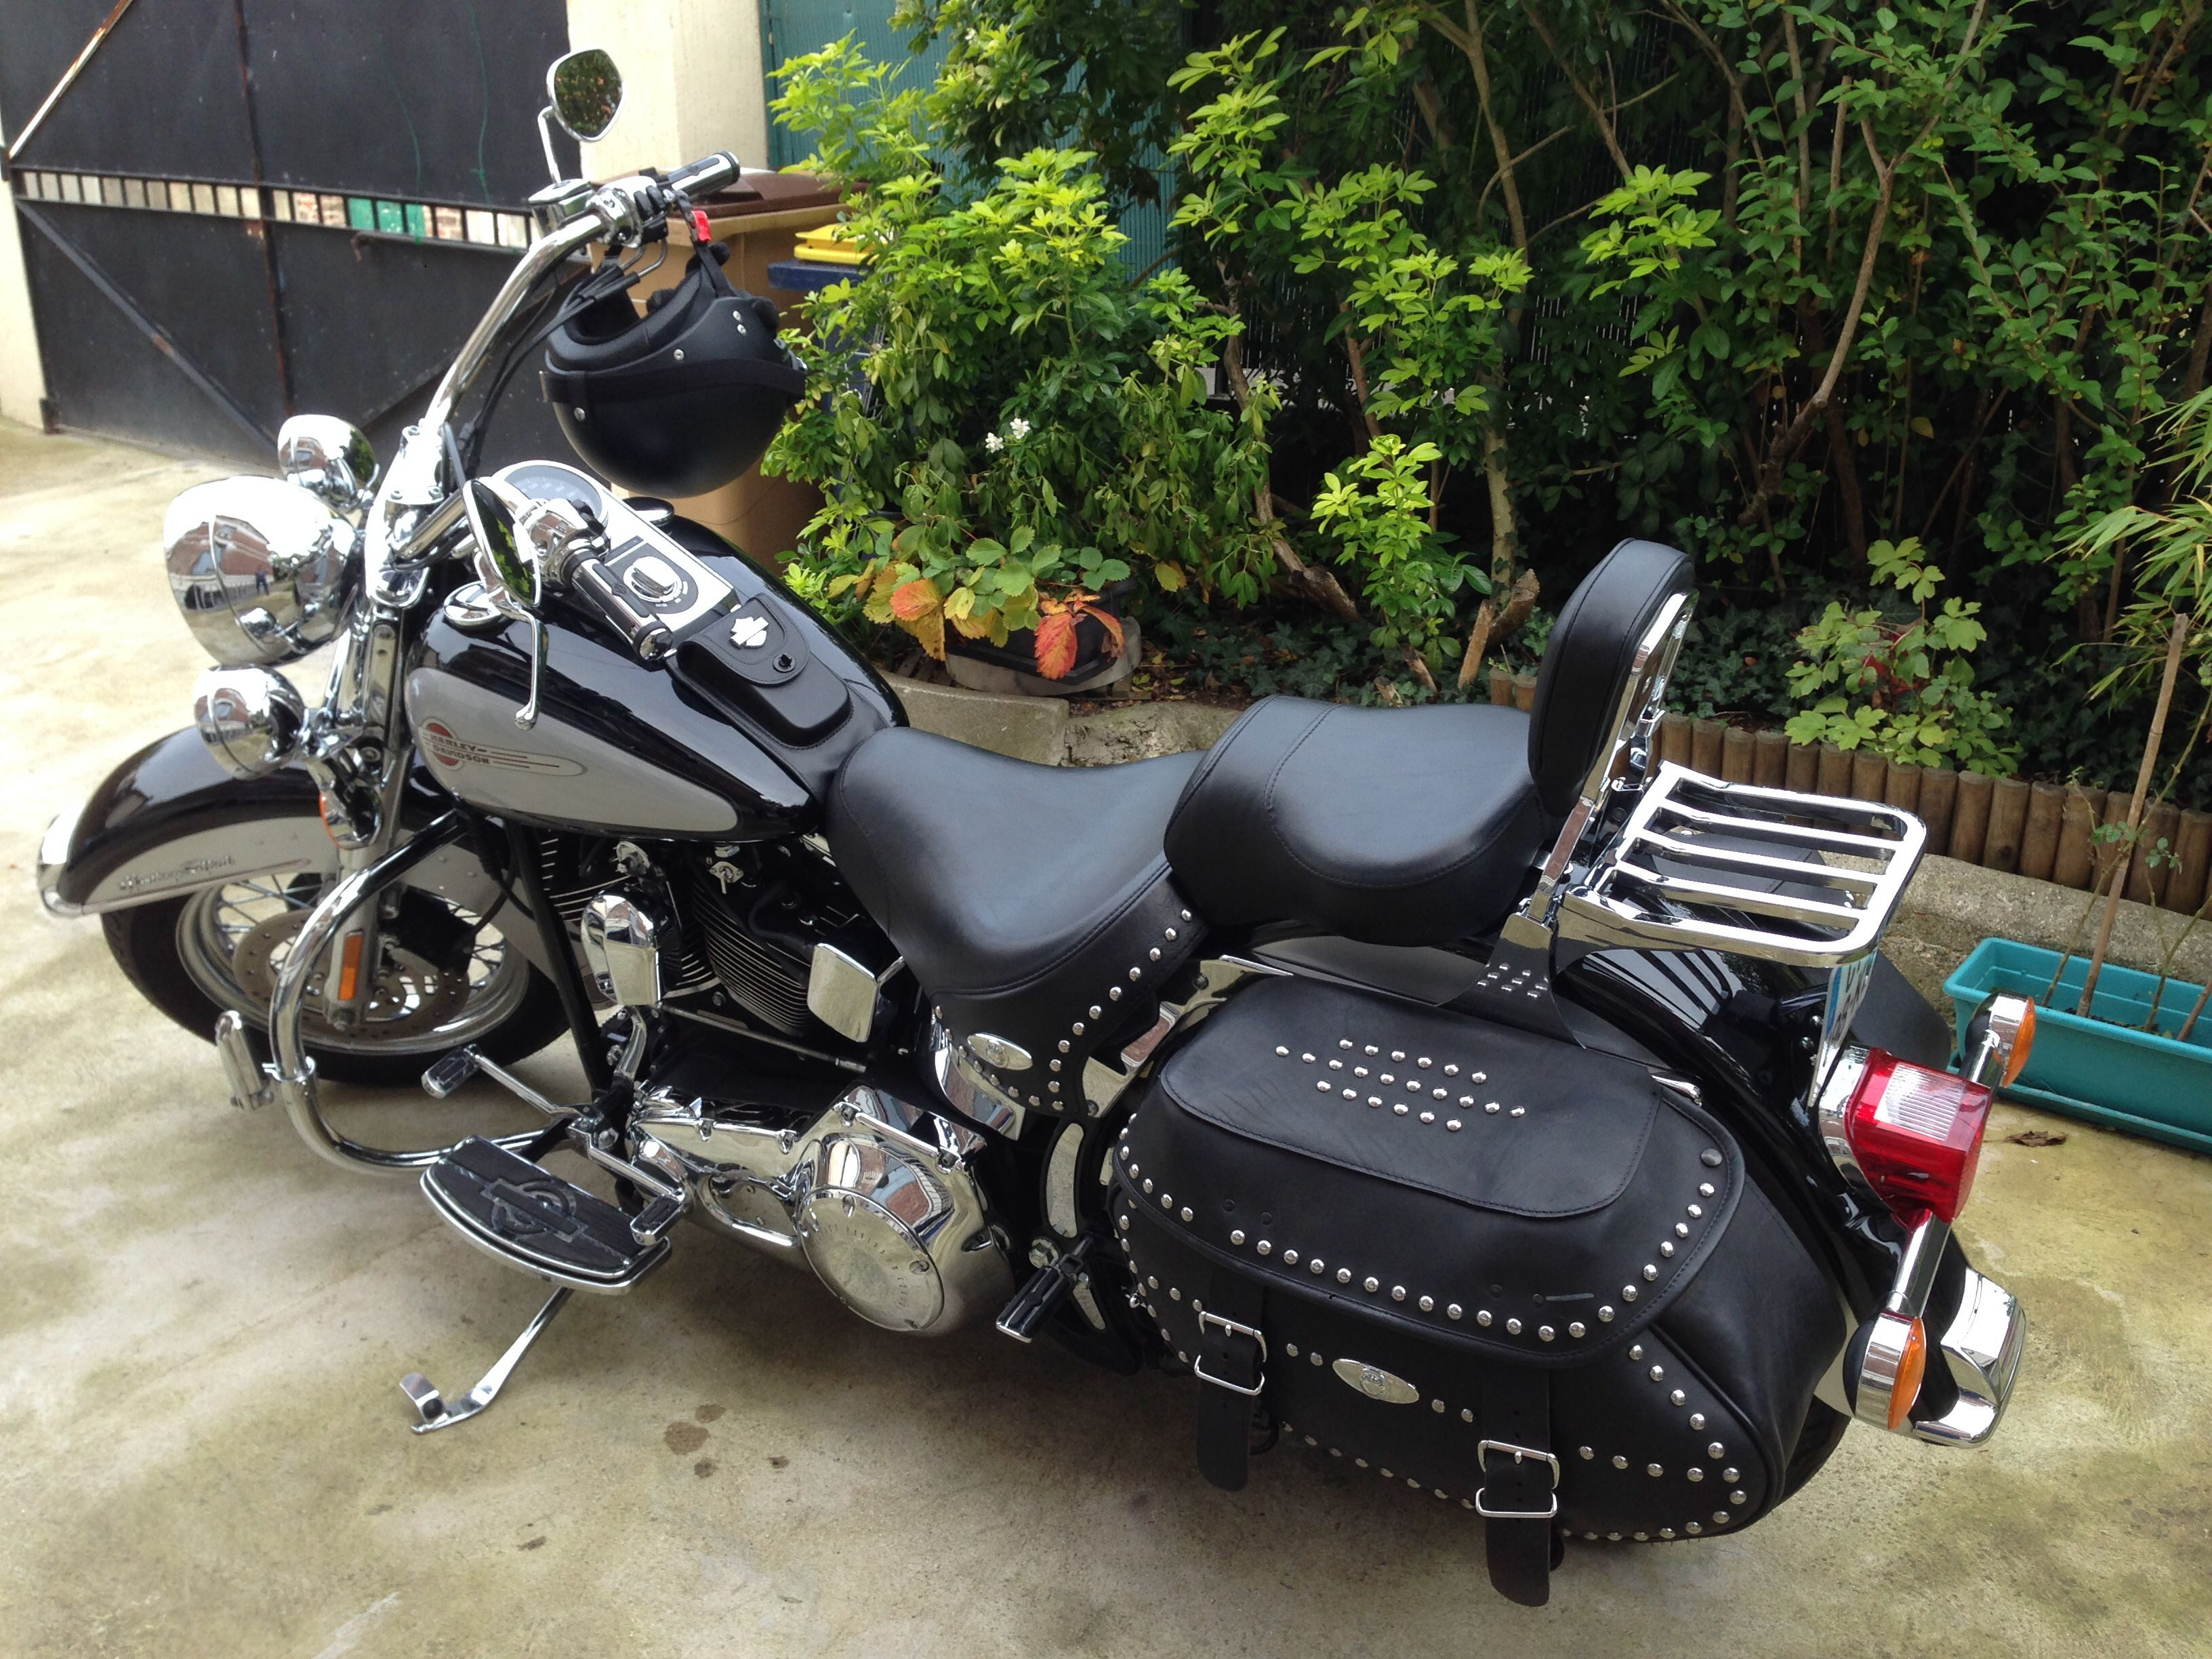 Hd Softail Heritage Classic 2000 Monster Bike Harley Davidson Motorcycles Softail [ 2448 x 3264 Pixel ]